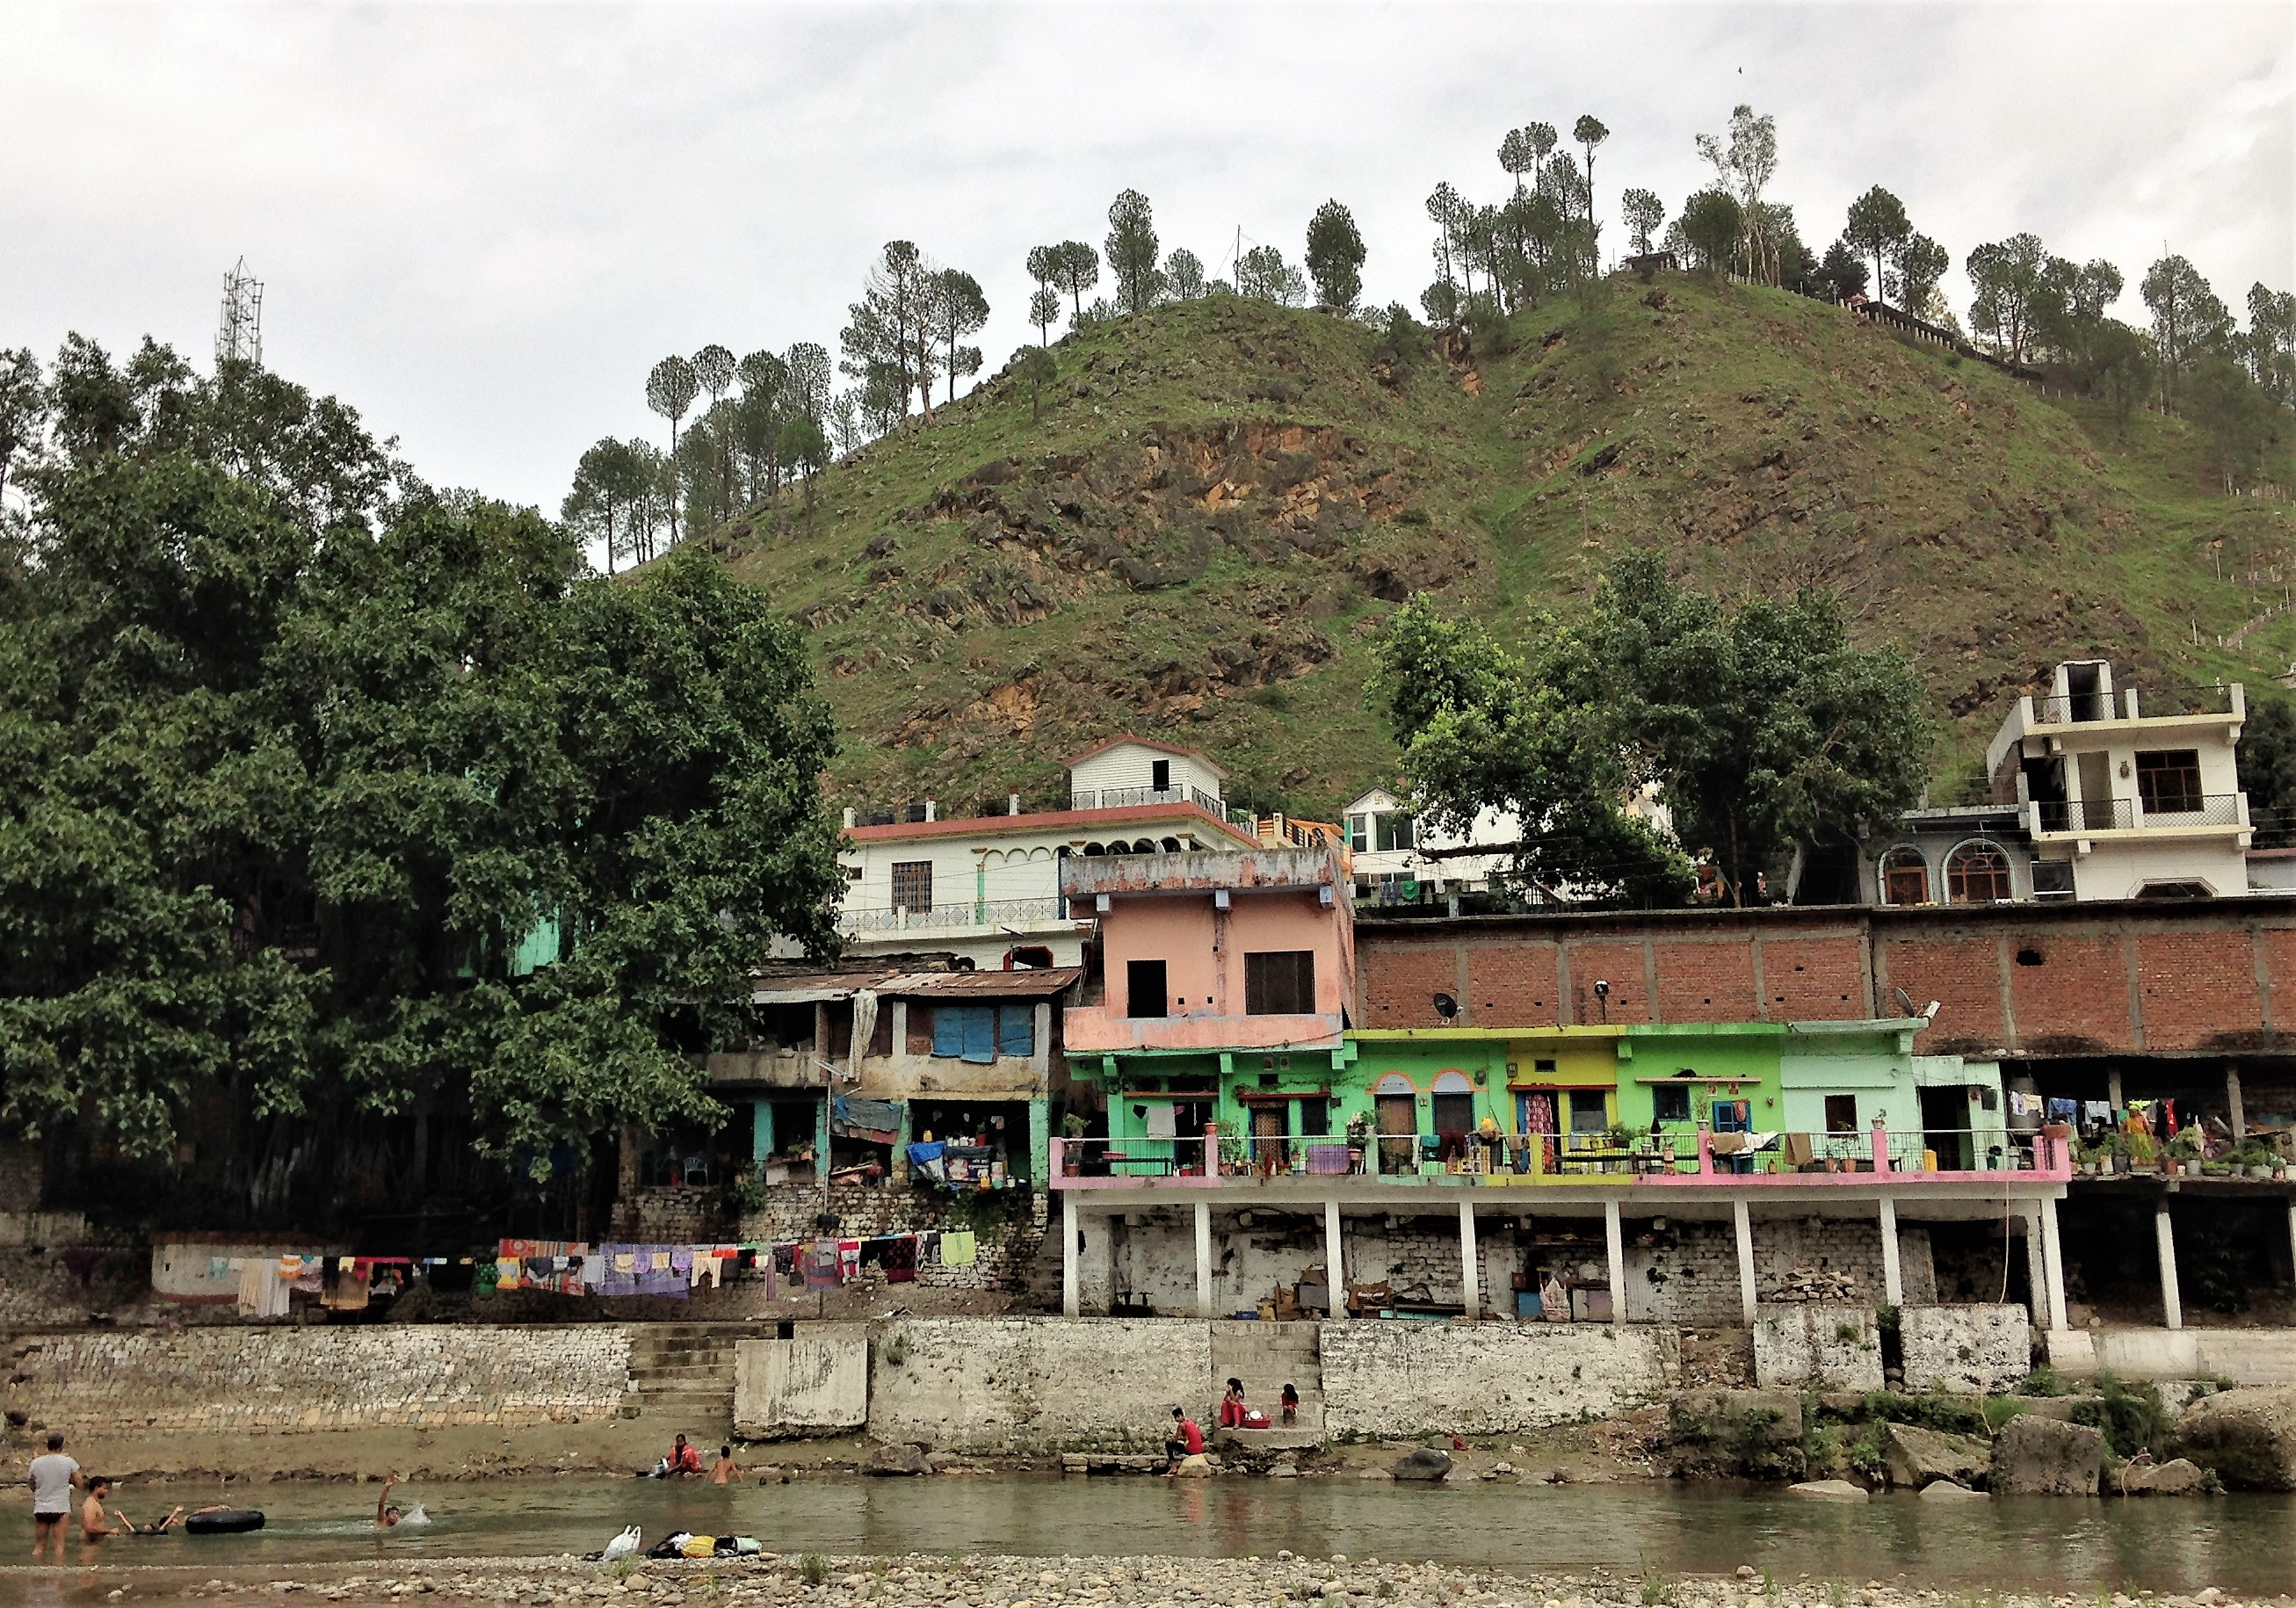 View of Chandika Temple high on a hill above the Saryu River, Bageshwar, Uttarakandh